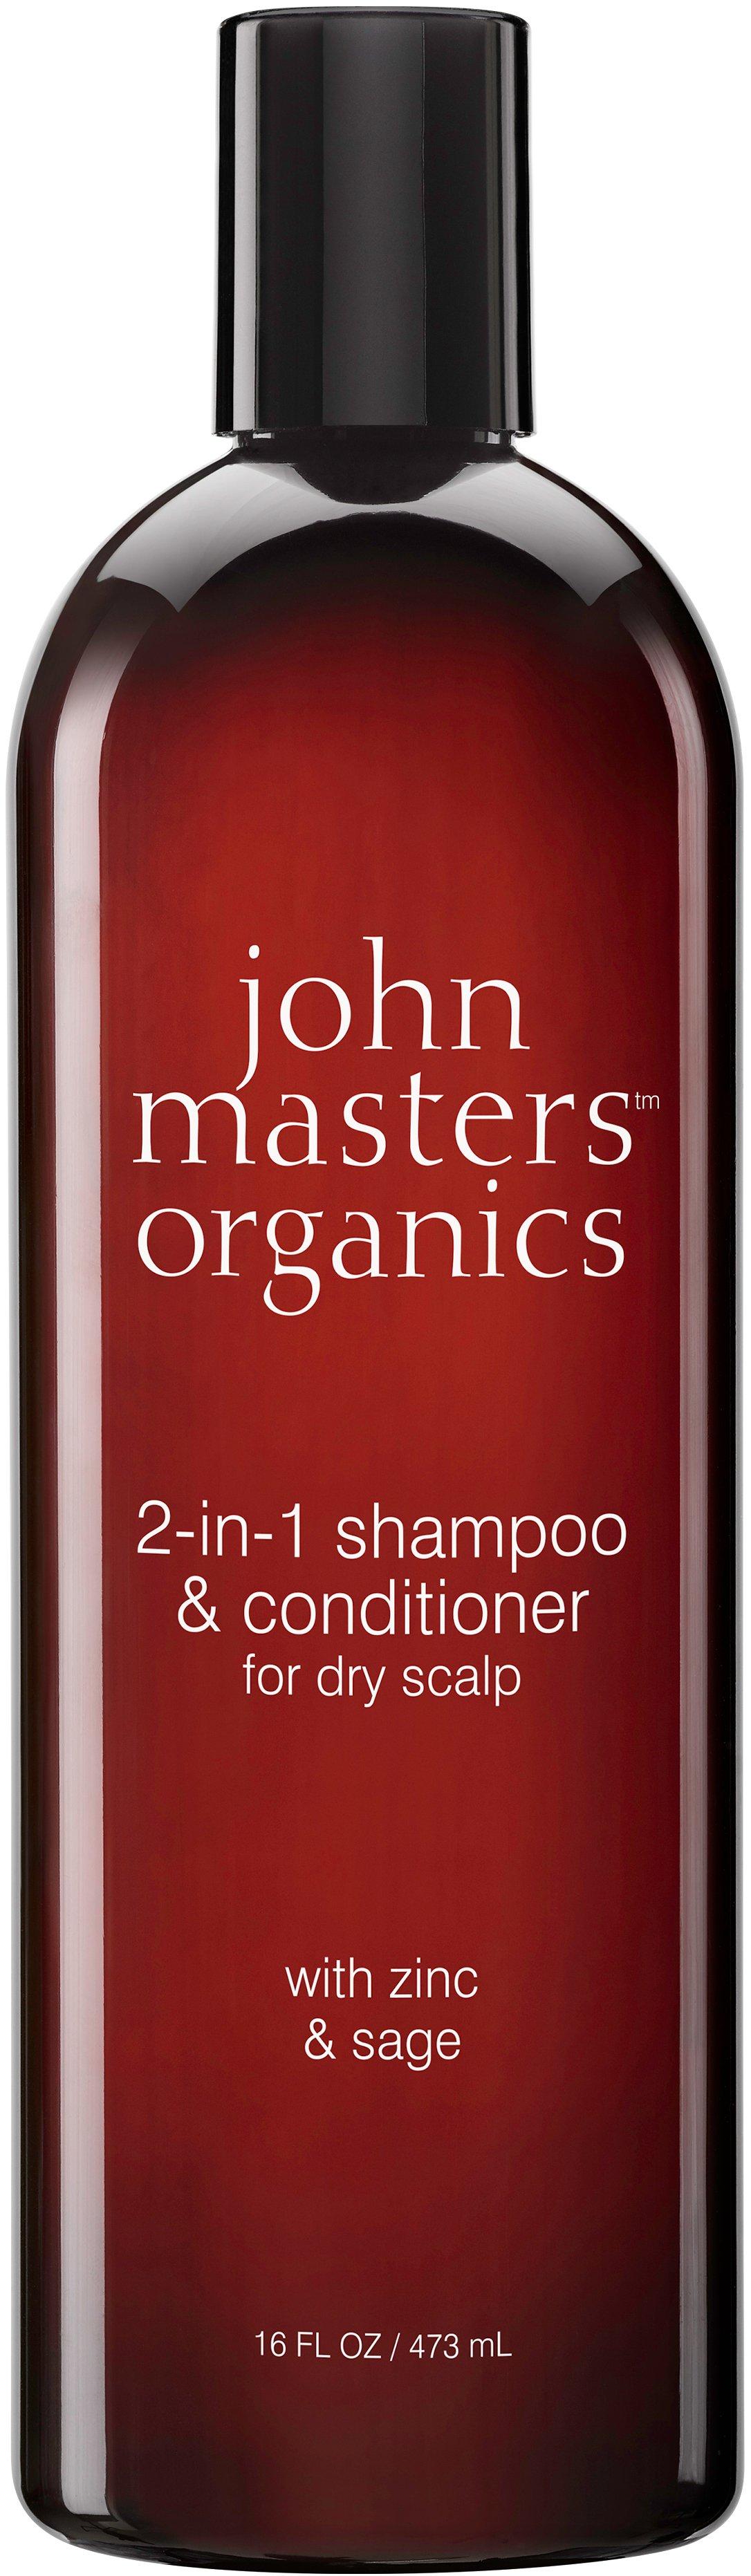 John Masters Organics - Zinc & Sage Shampoo With Conditioner 473 ml